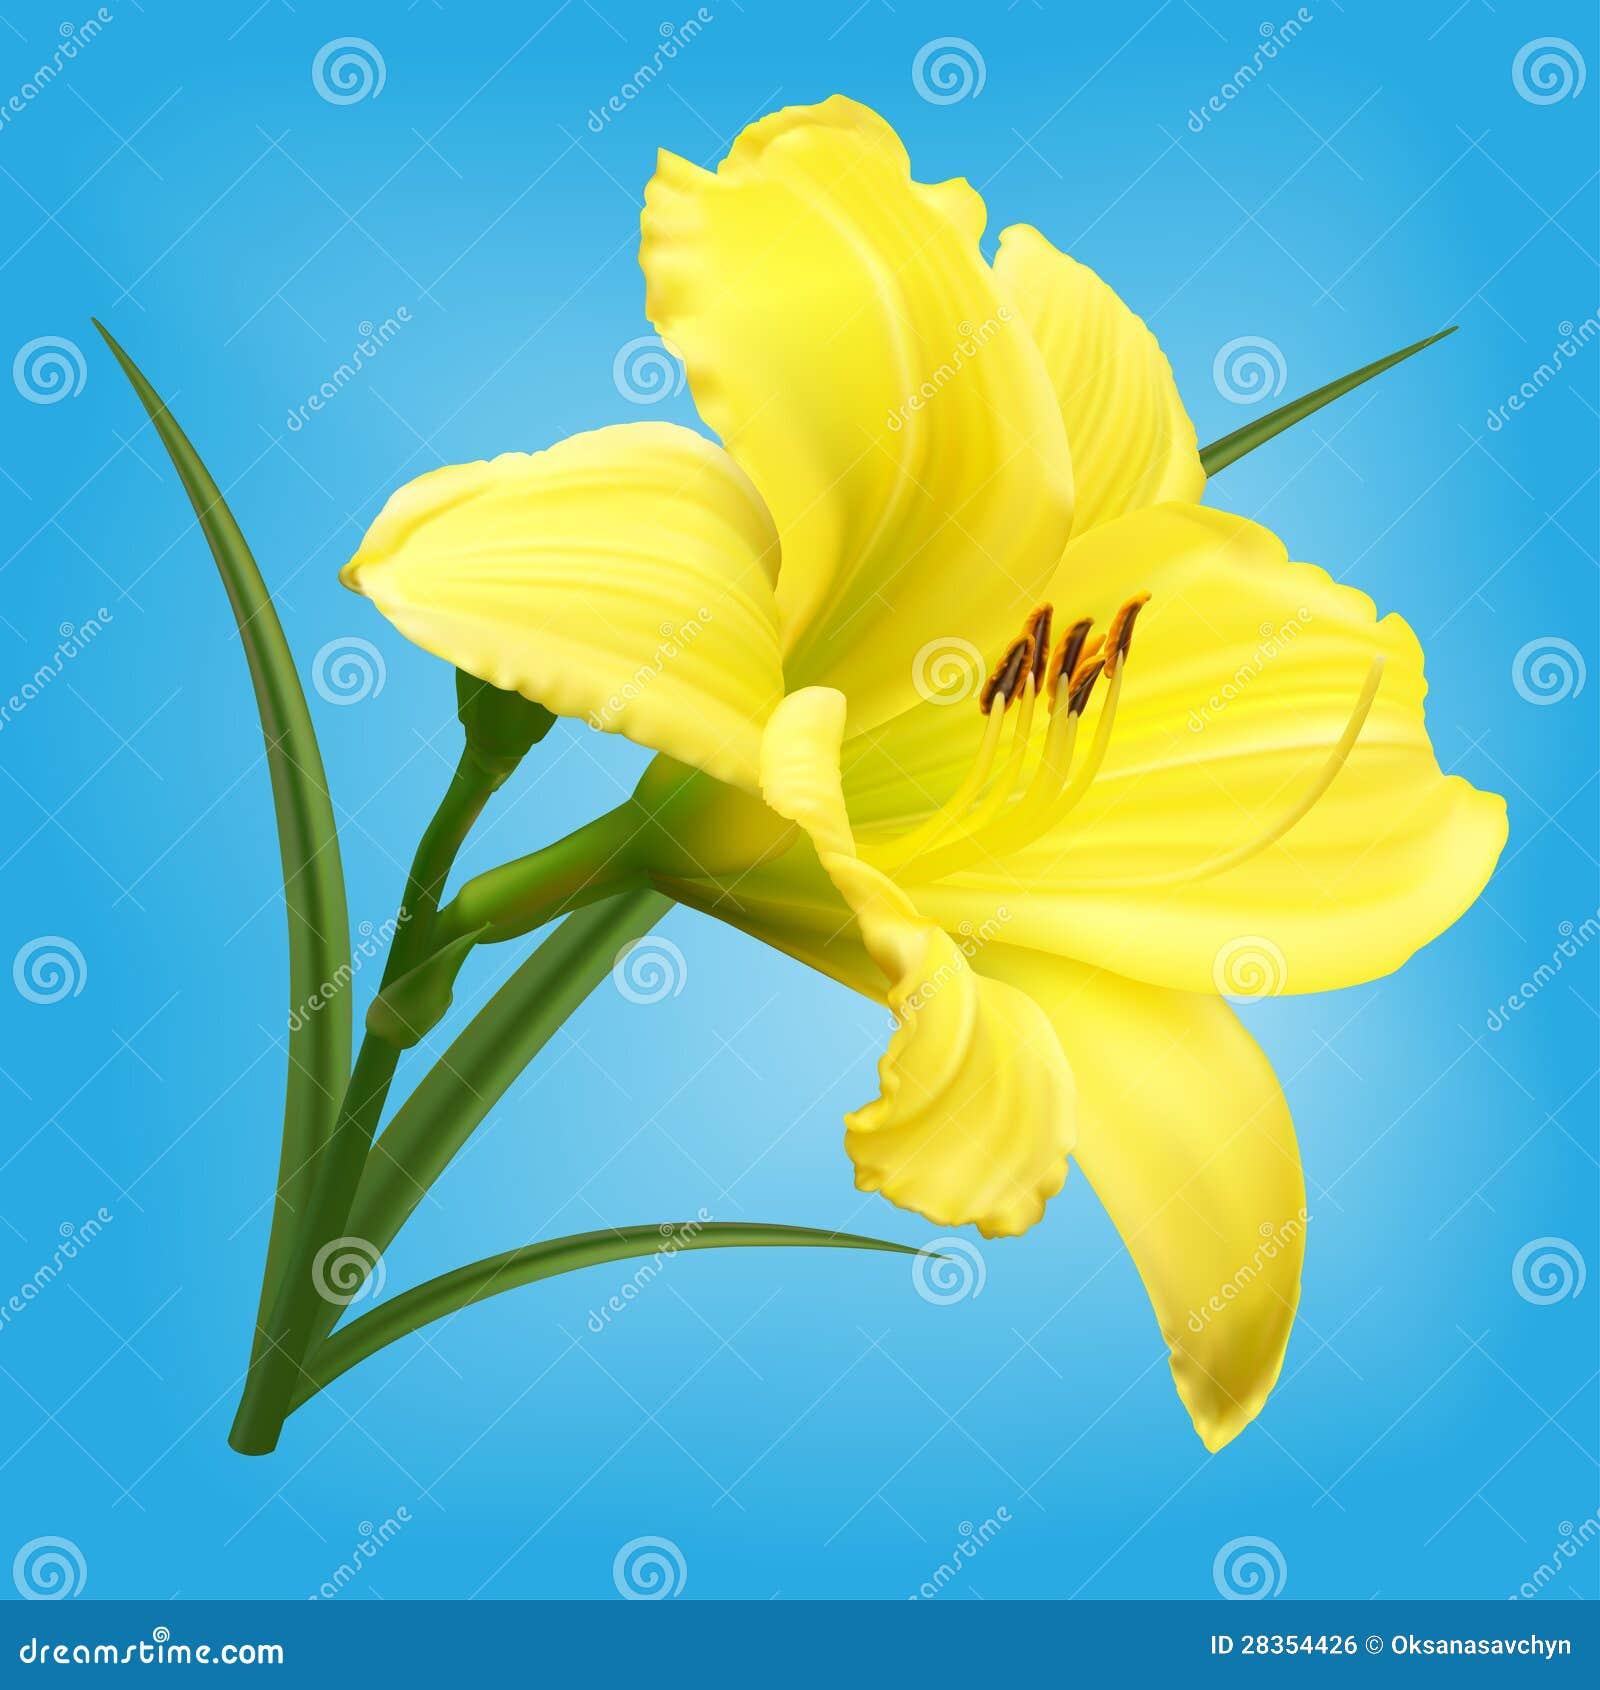 Yellow lily flower on light blue background stock vector yellow lily flower on light blue background izmirmasajfo